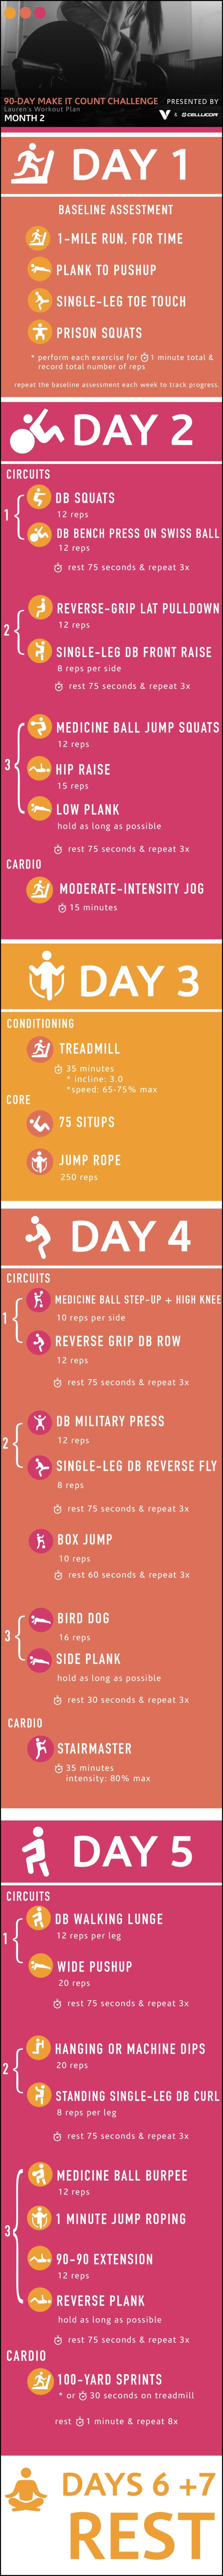 Lauren's Workout Plan Month 2.jpg